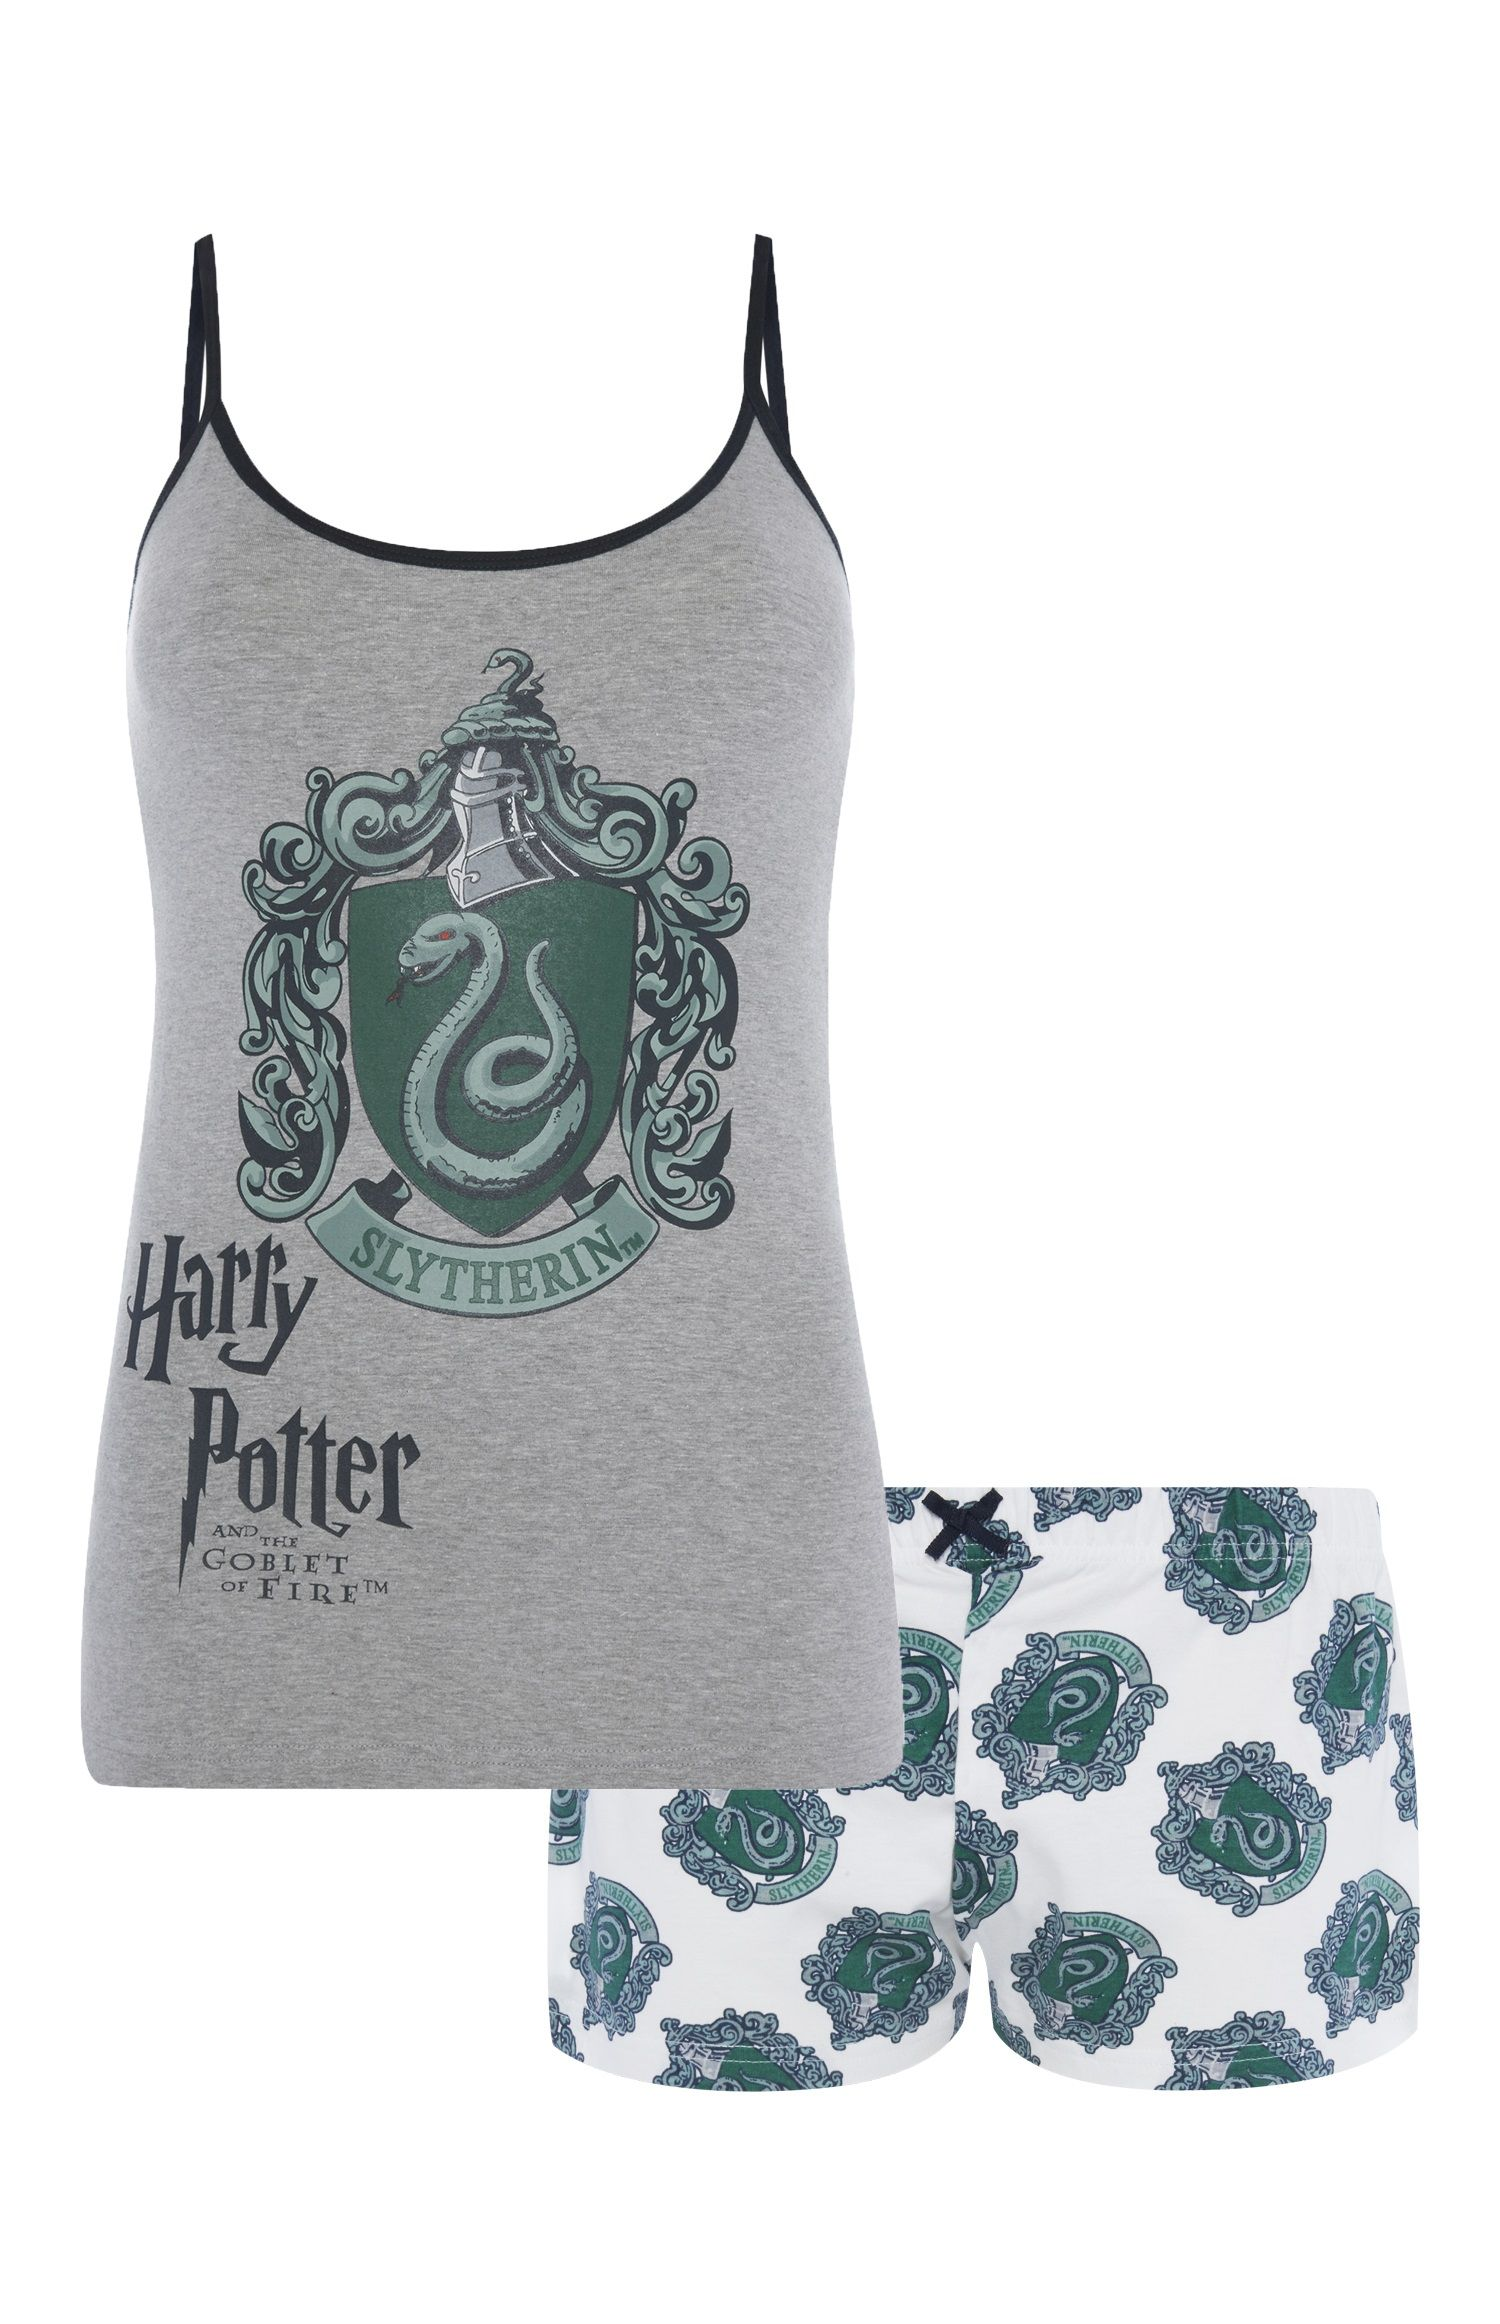 Harry Potter Pyjama Set All House Camiset Vest Short Nightwear Womens Primark